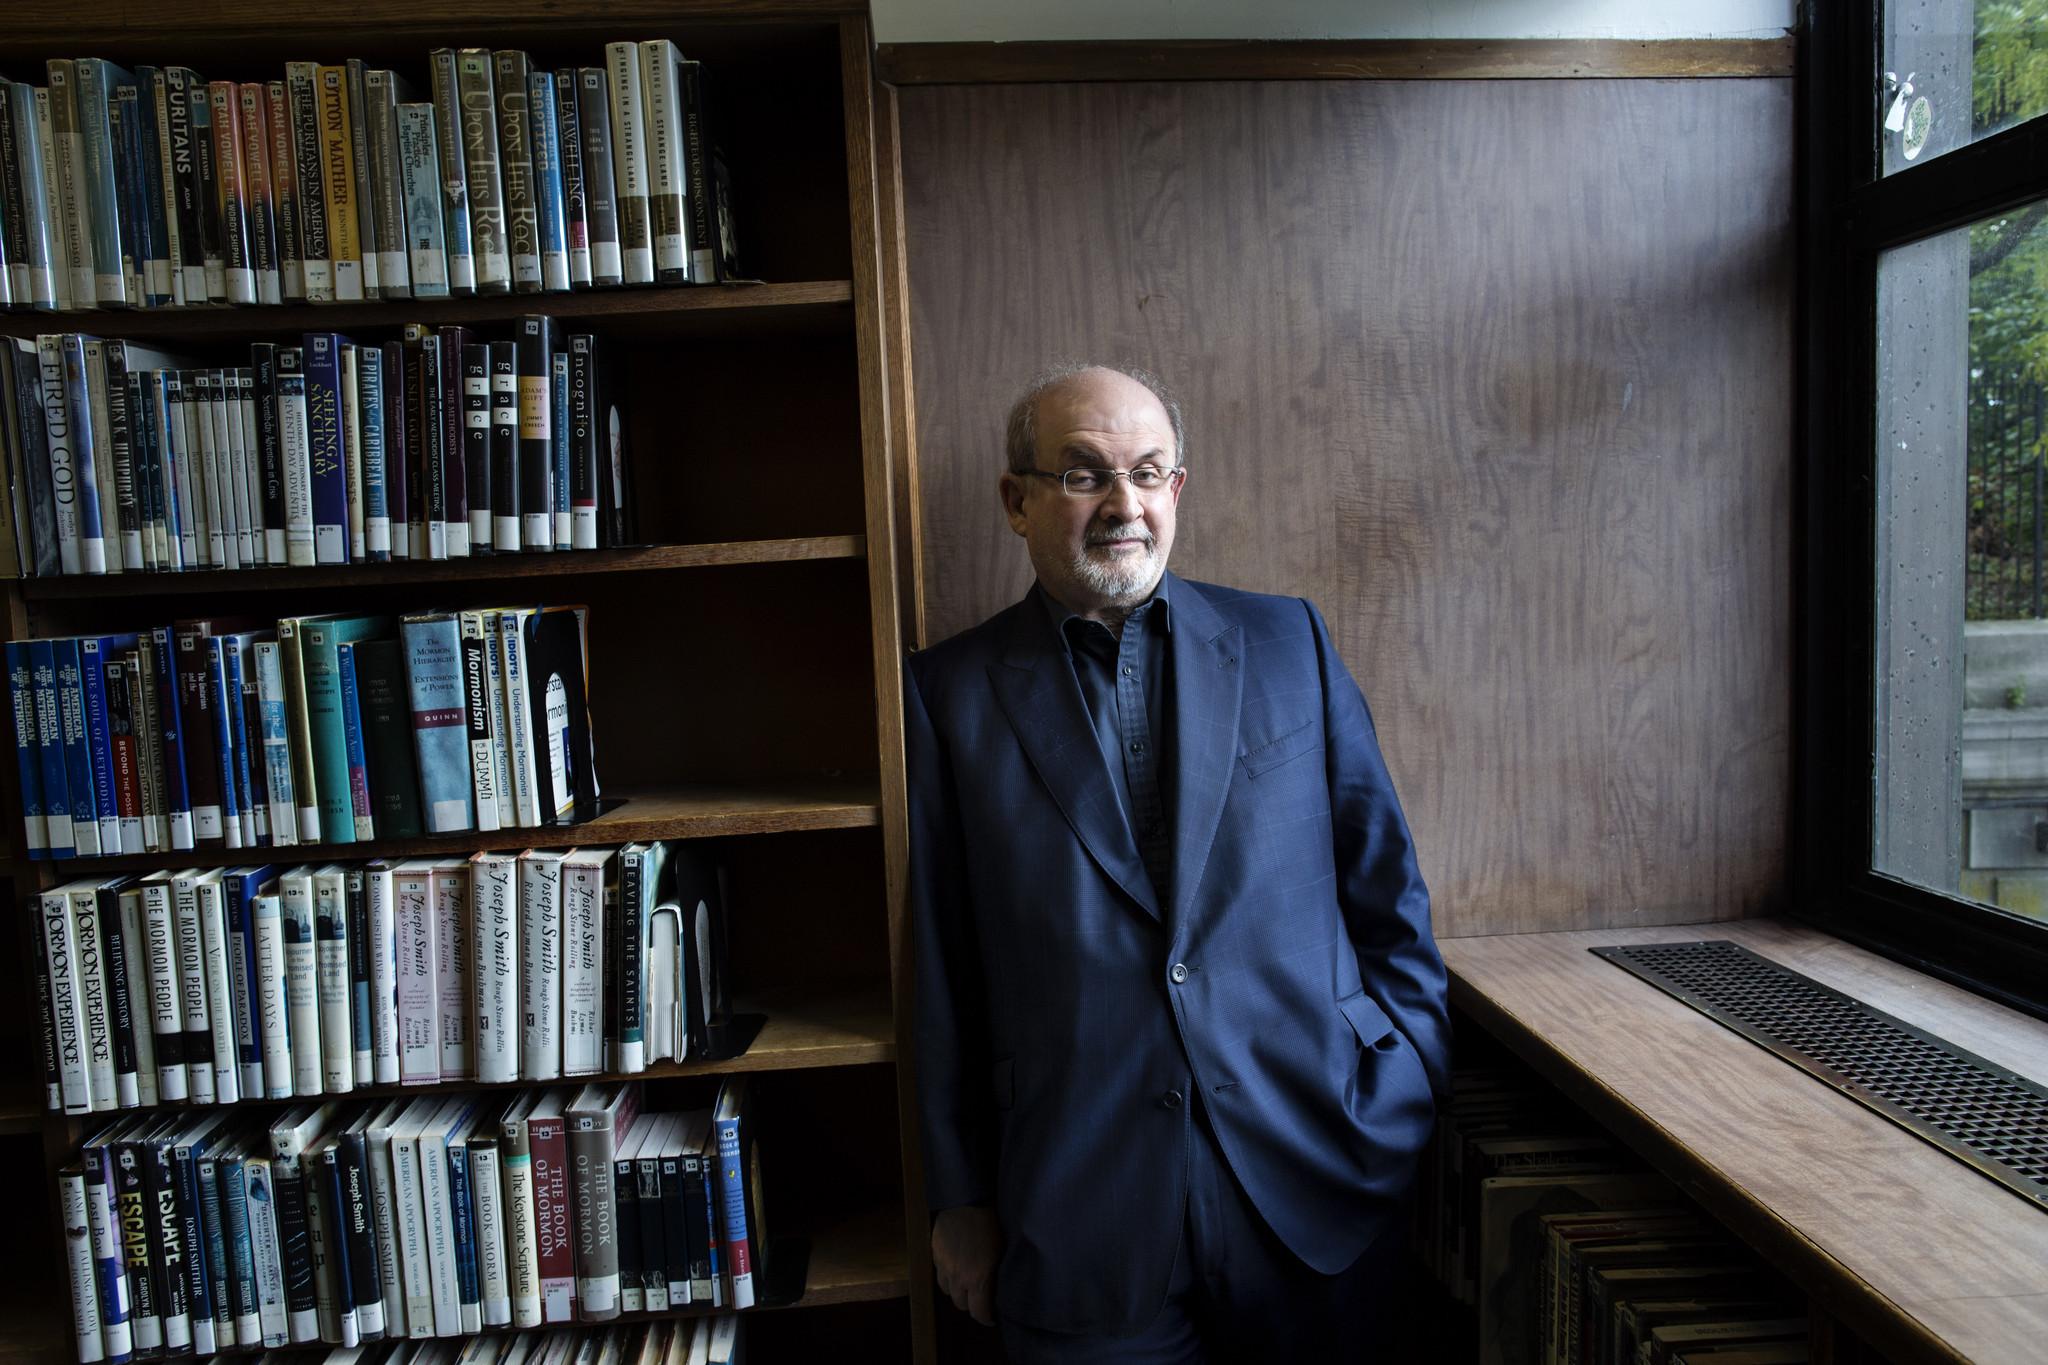 Salman Rushdie's life of literary risk-taking